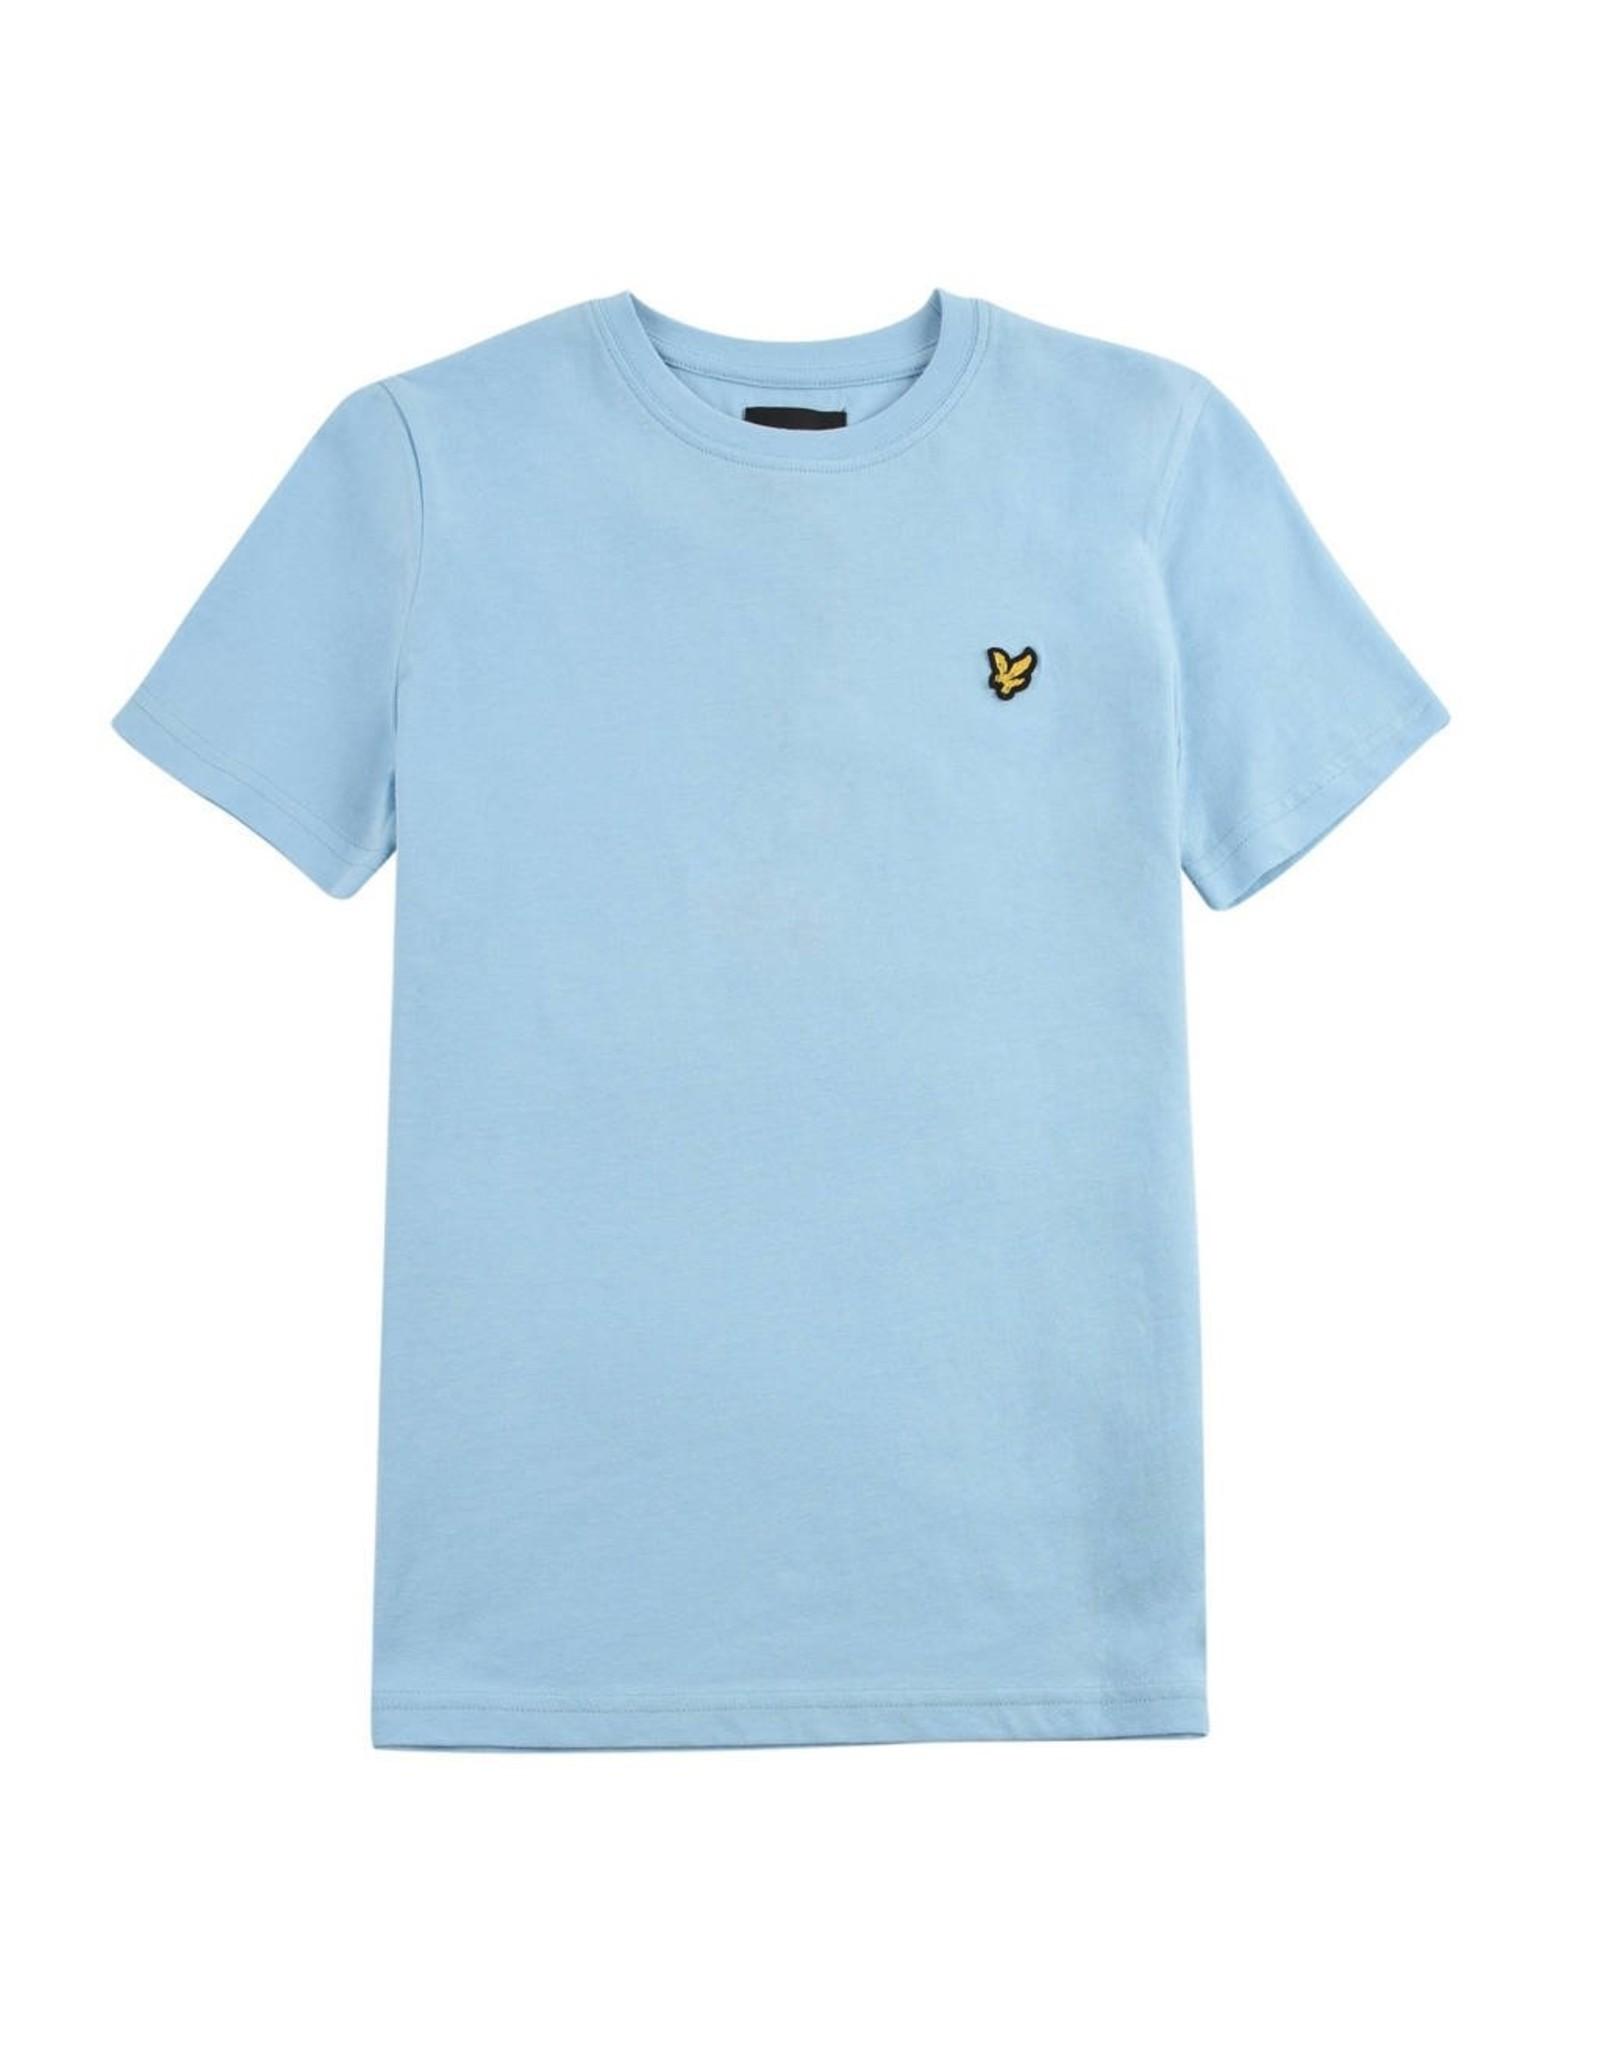 Lyle & Scott Boys Classic T-Shirt Sky Blue